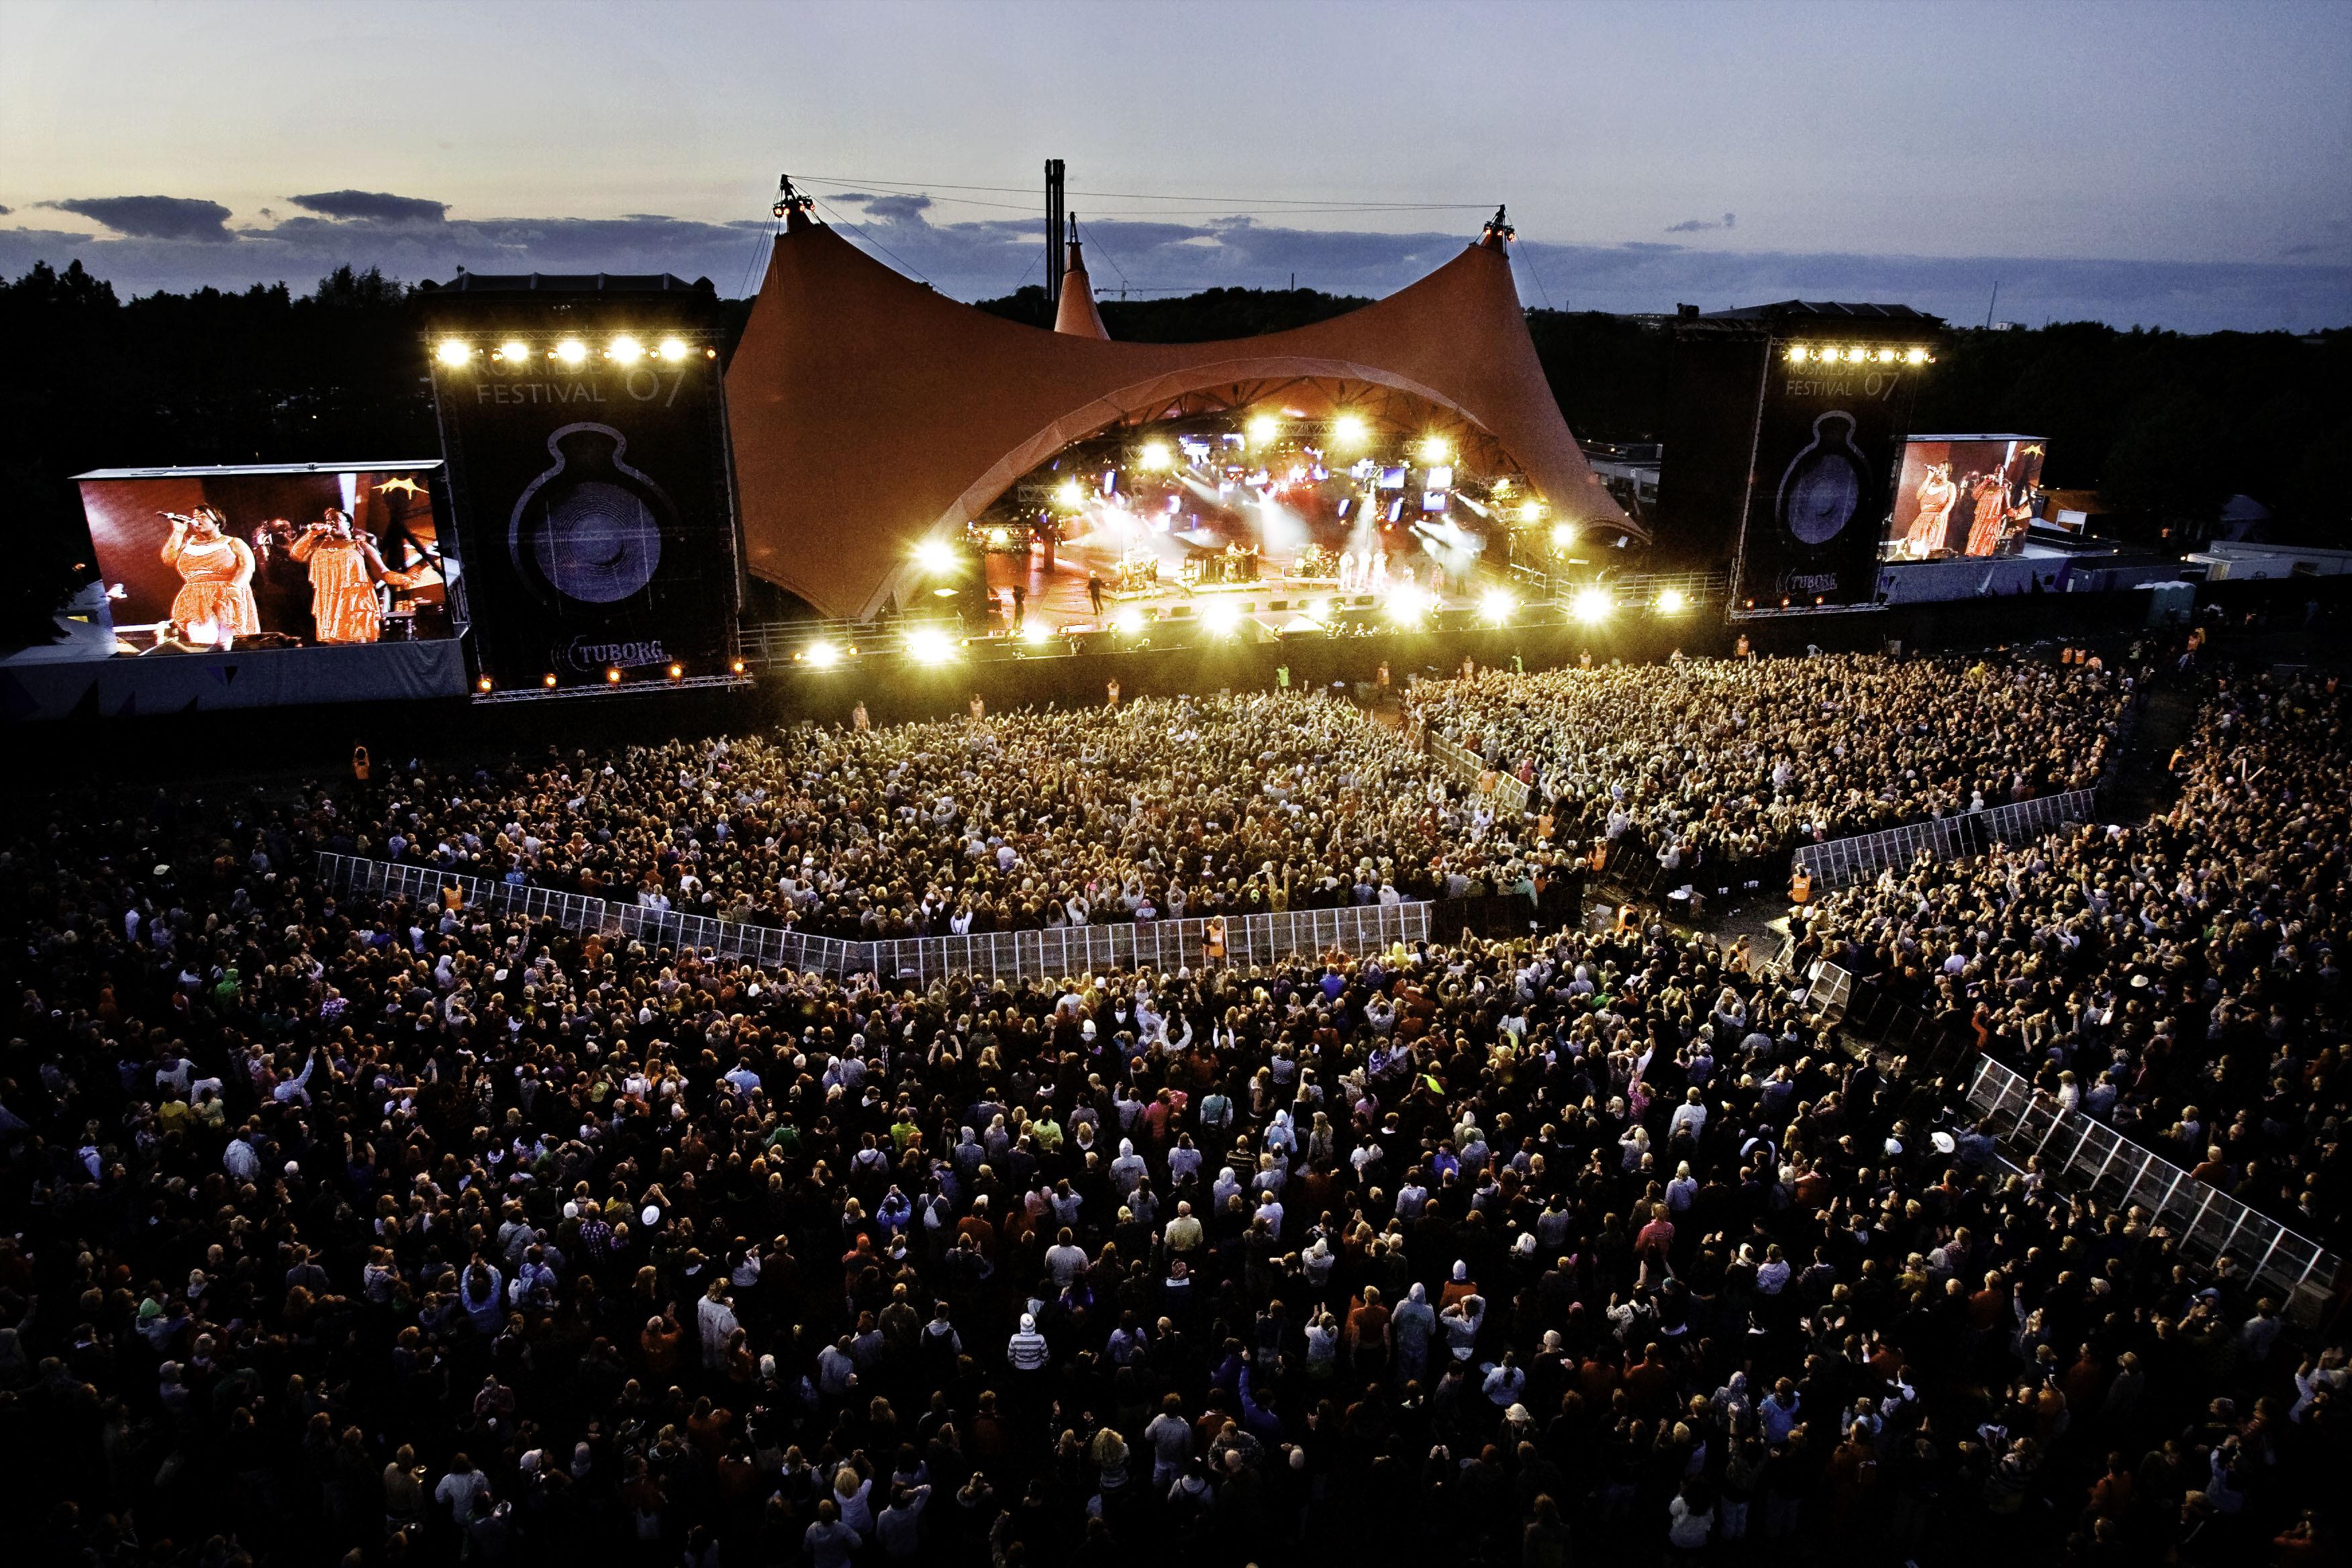 罗斯基勒音乐节(Roskilde Festival)